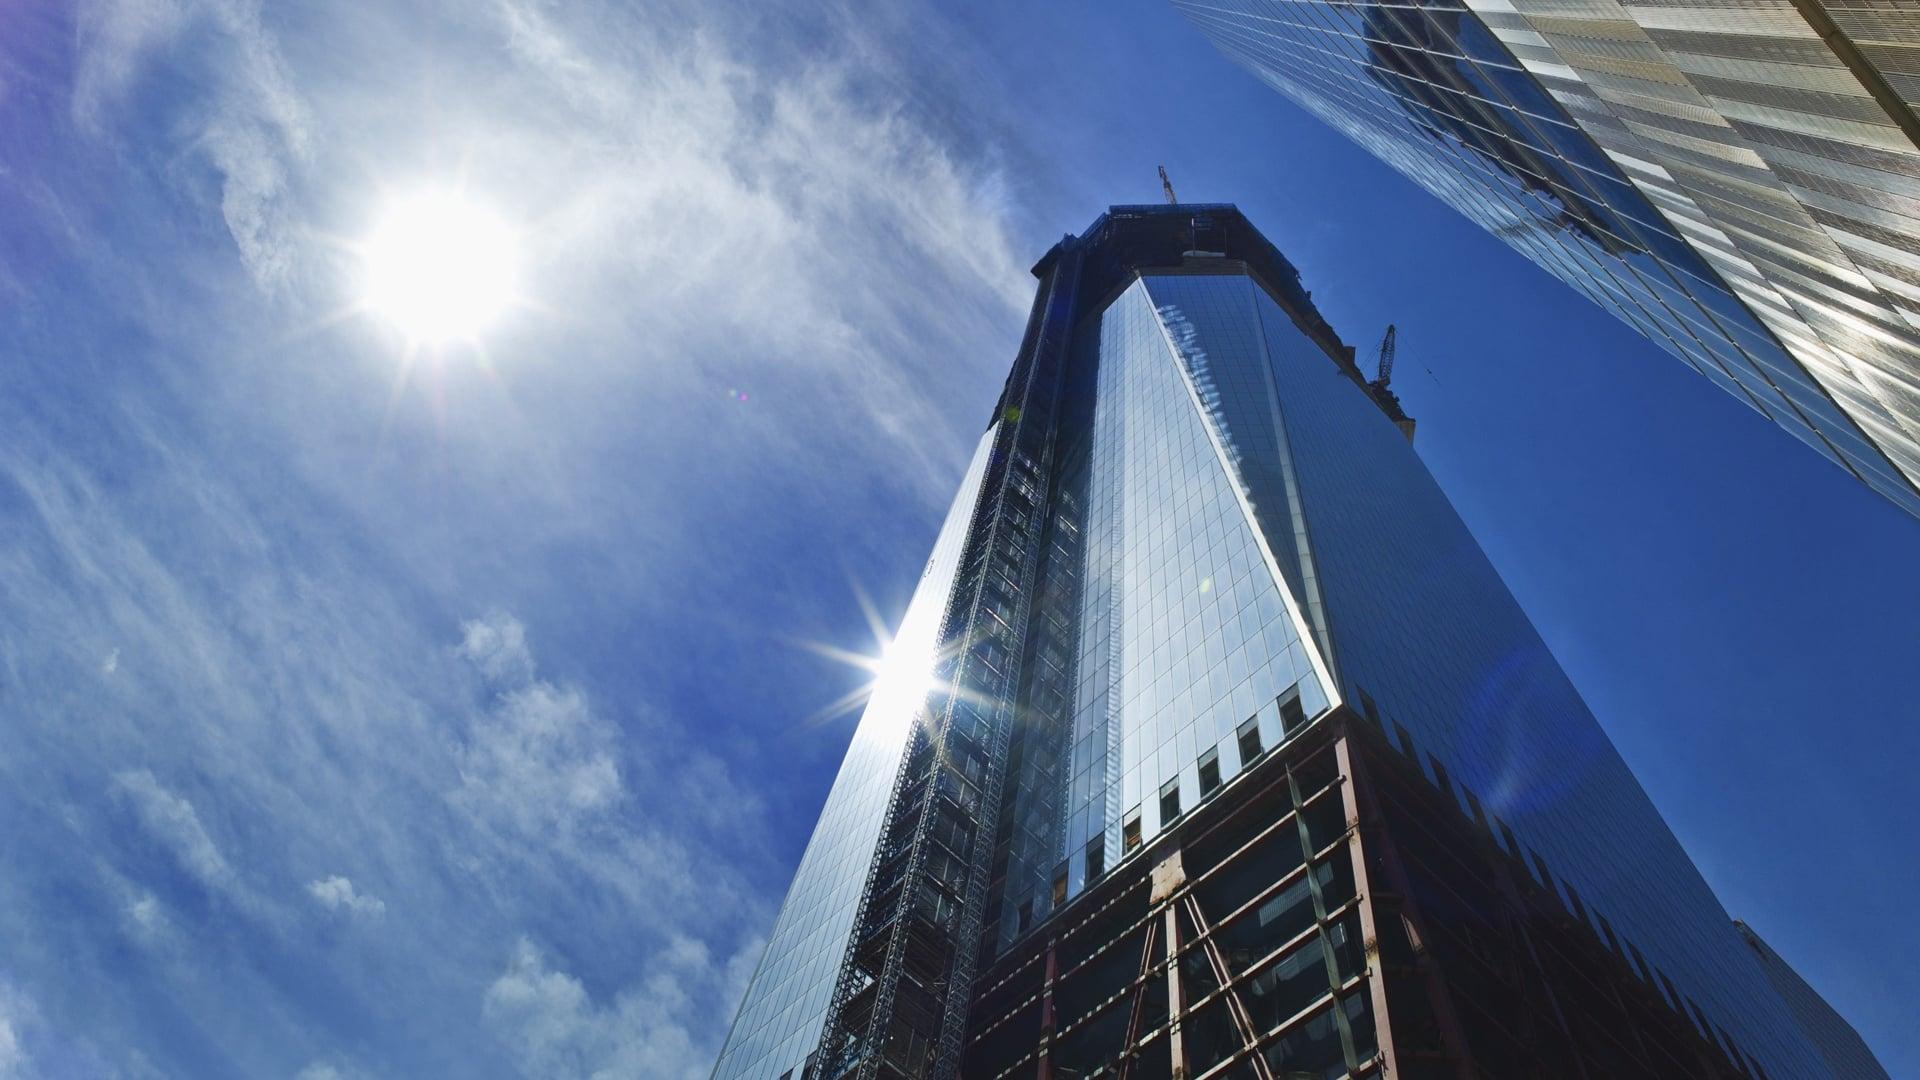 NOVA Season 41 :Episode 1  Ground Zero Supertower